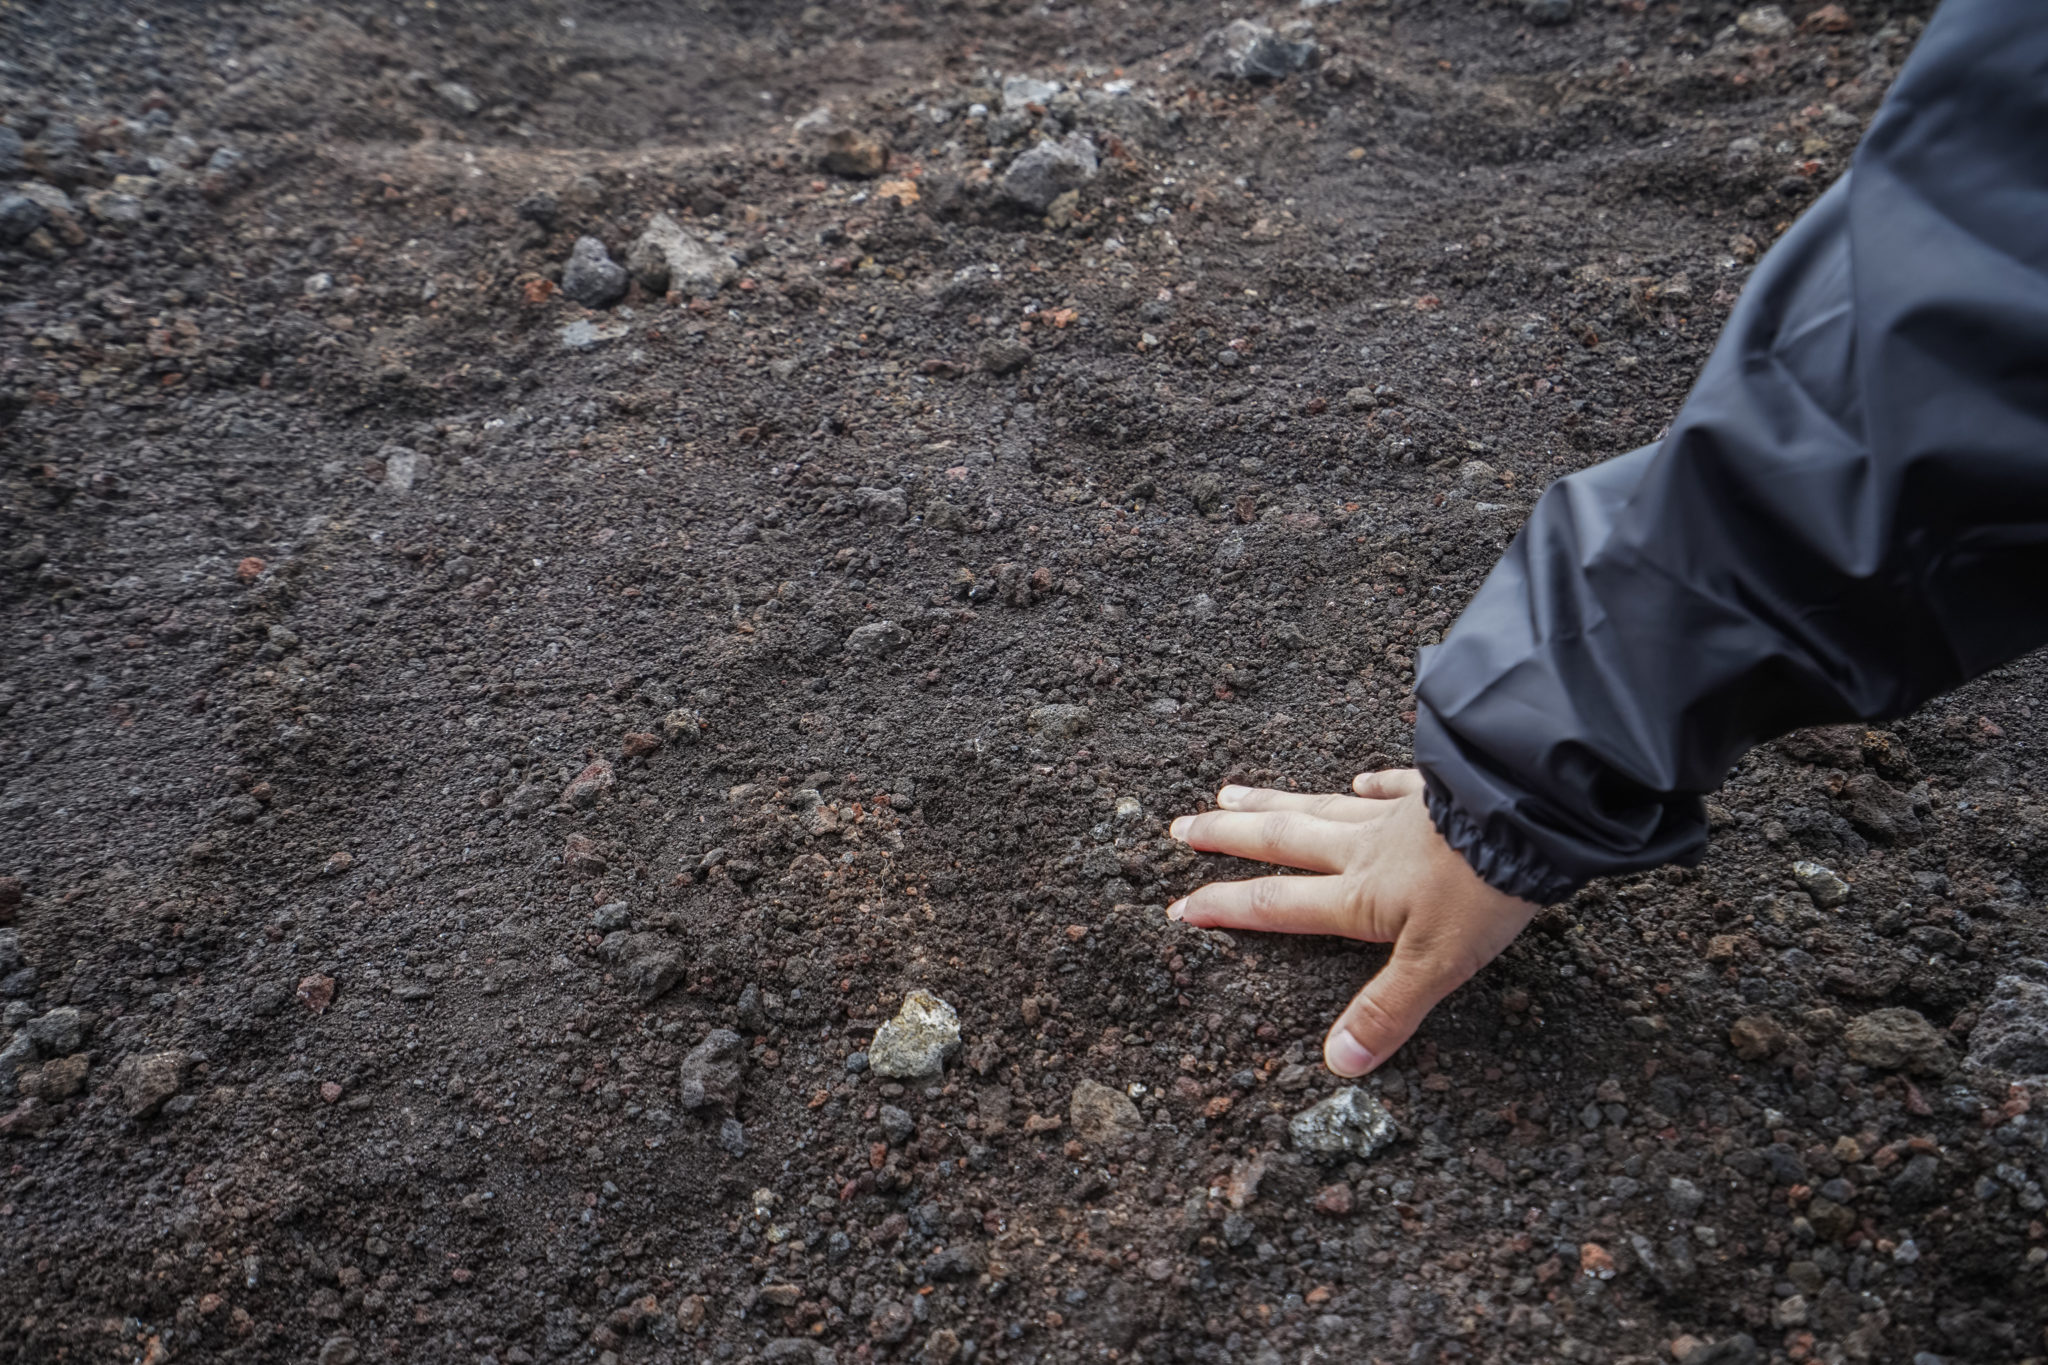 Etna-sicile-volcan-excursion-eruption-roche-catane